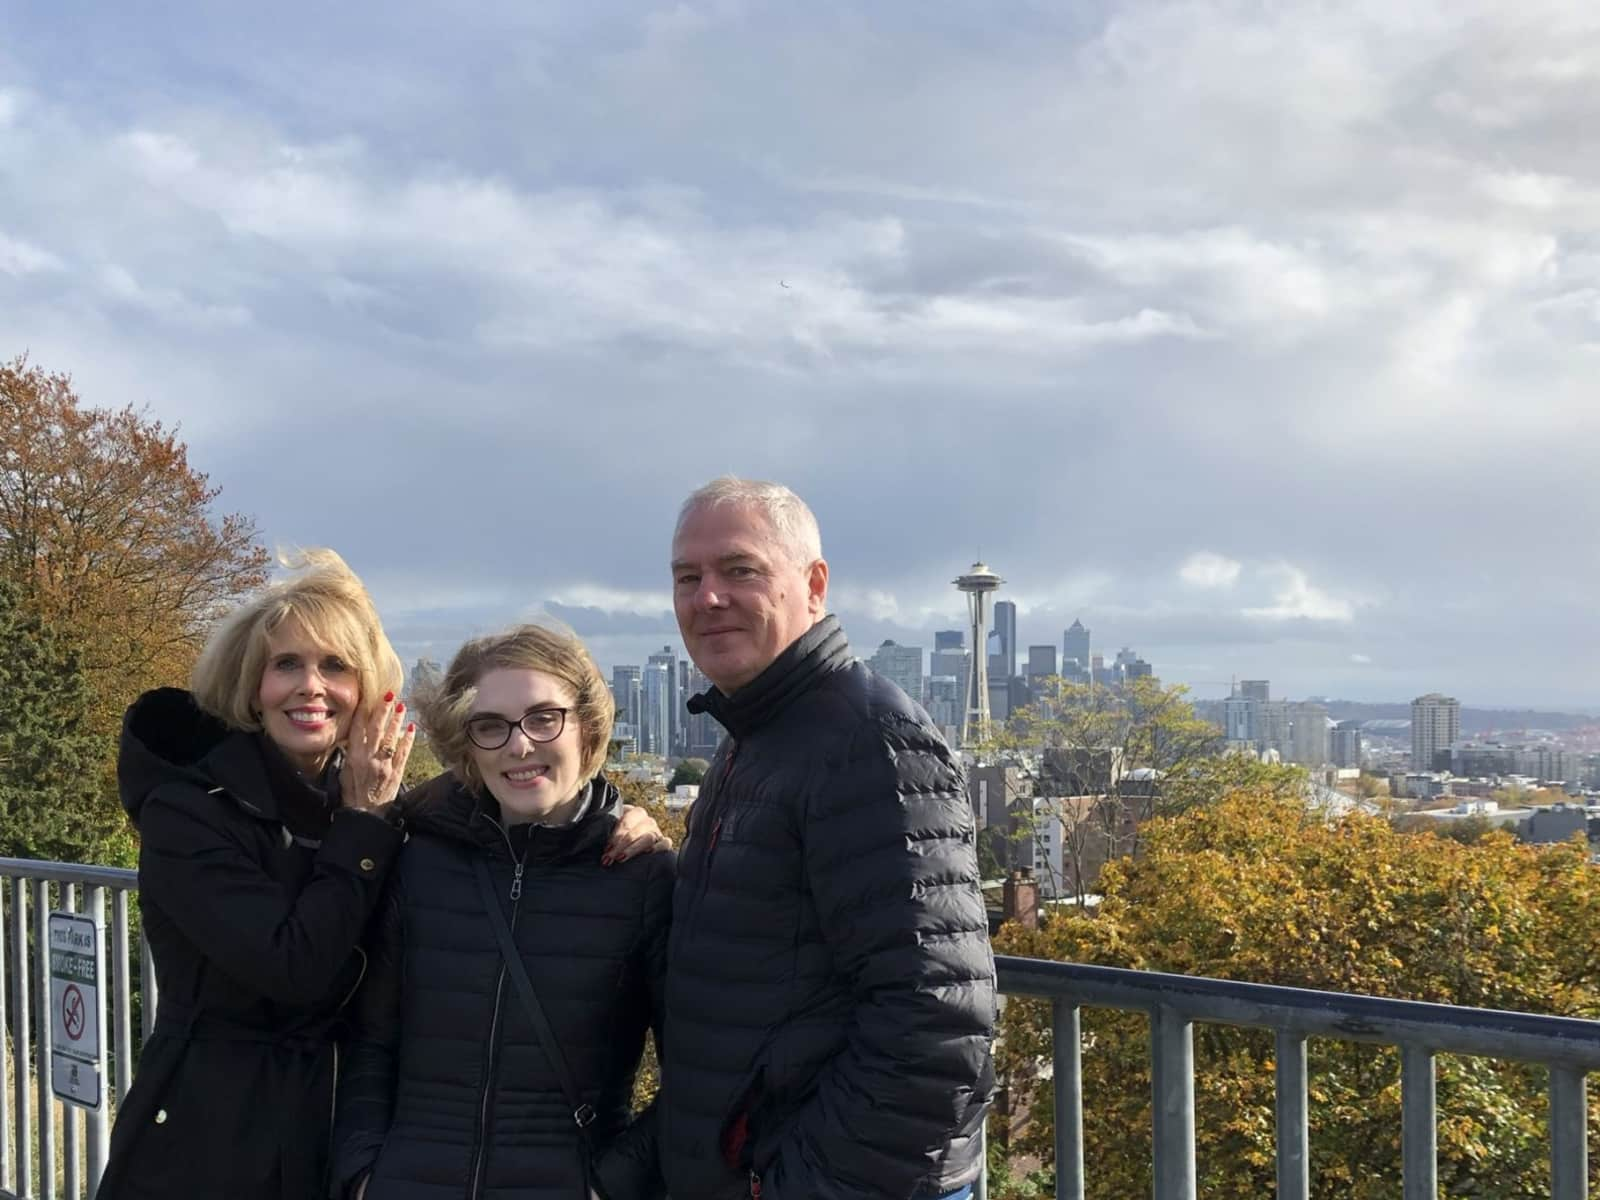 Debbie & Louie from Tacoma, Washington, United States